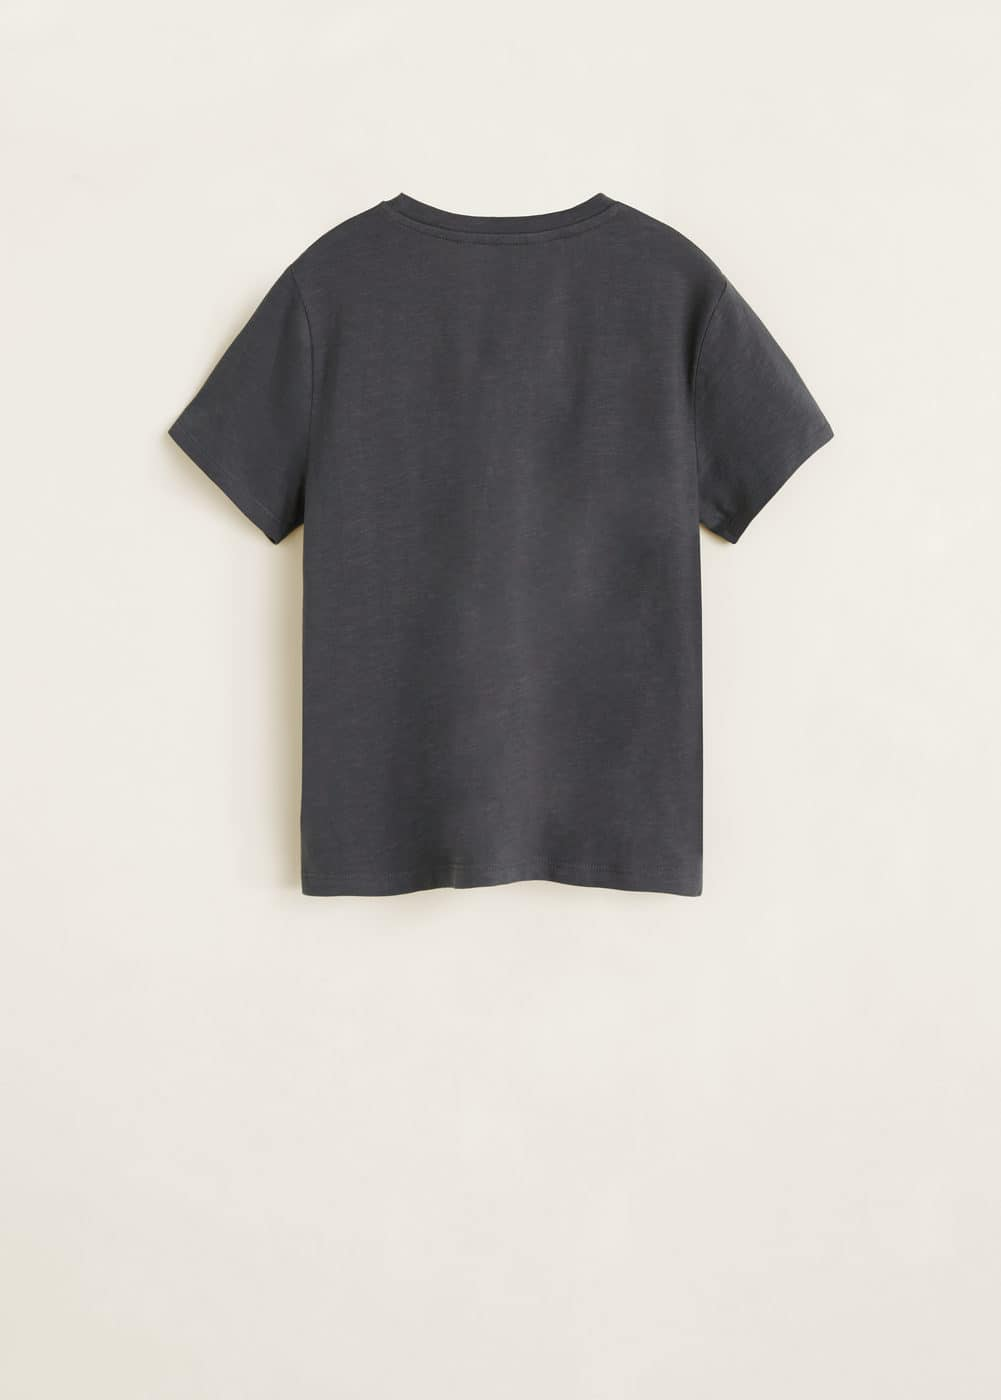 Mango - Camiseta lentejuelas reversibles - 6